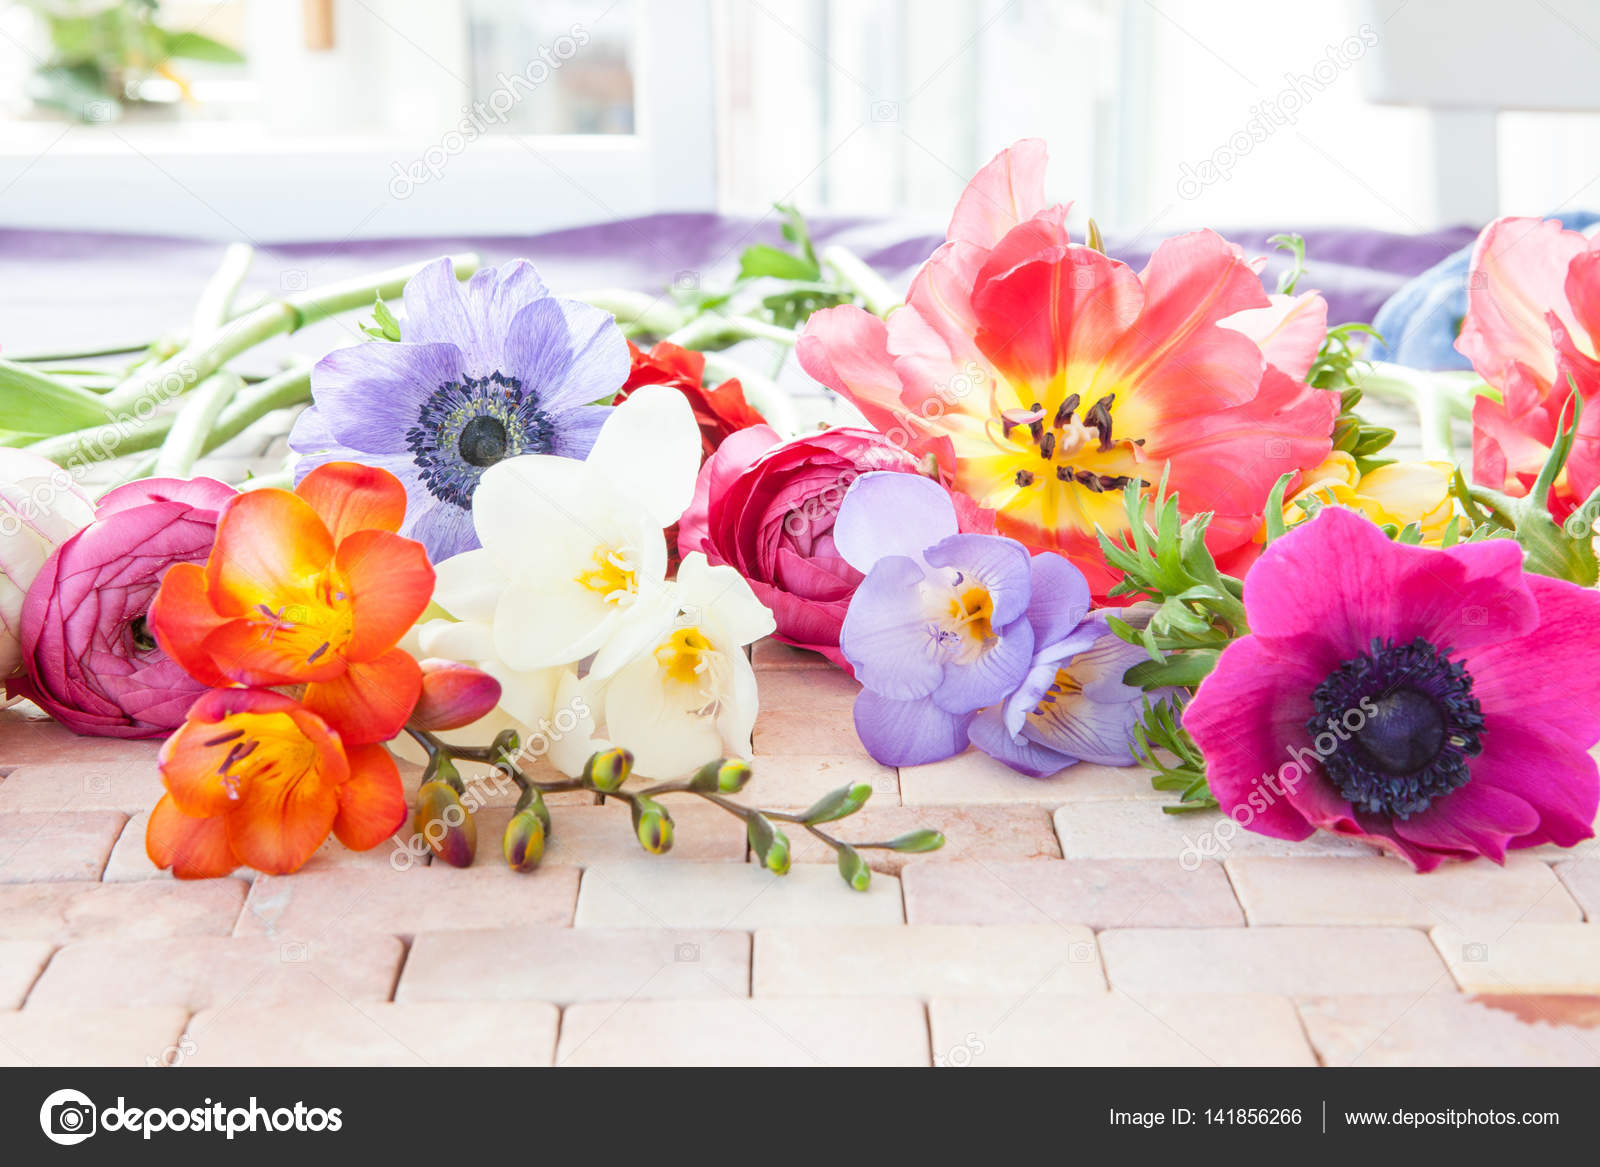 Colorful Spring Flowers Stock Photo Barbaraneveu 141856266